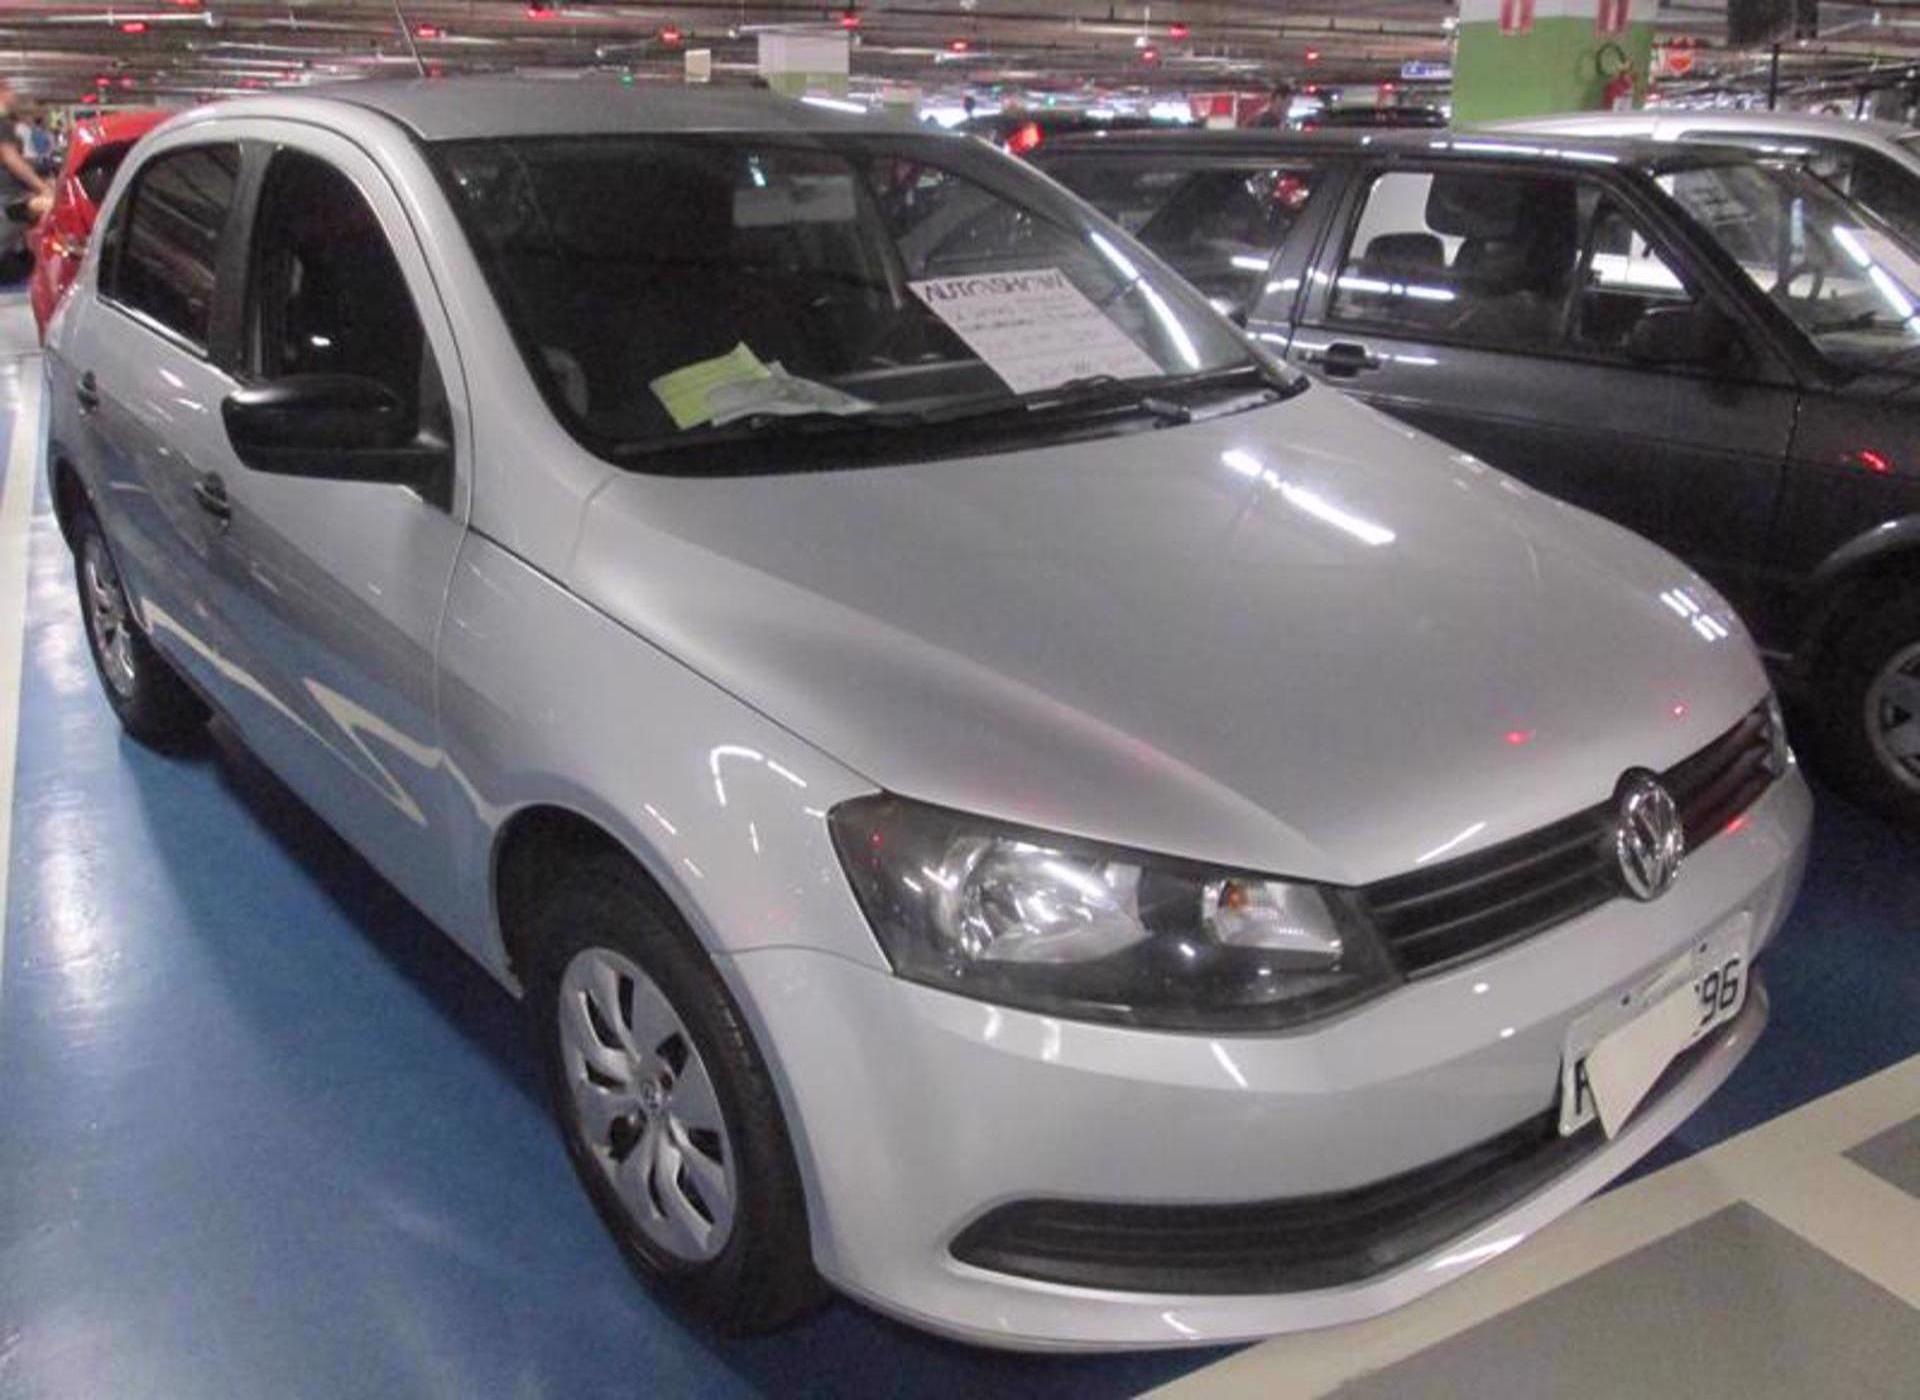 Feirão Auto Show Shopping ABC - VOLKSWAGEN GOL (NOVO) 1.0 MI TOTAL FLEX 8V 4P 2014-2015